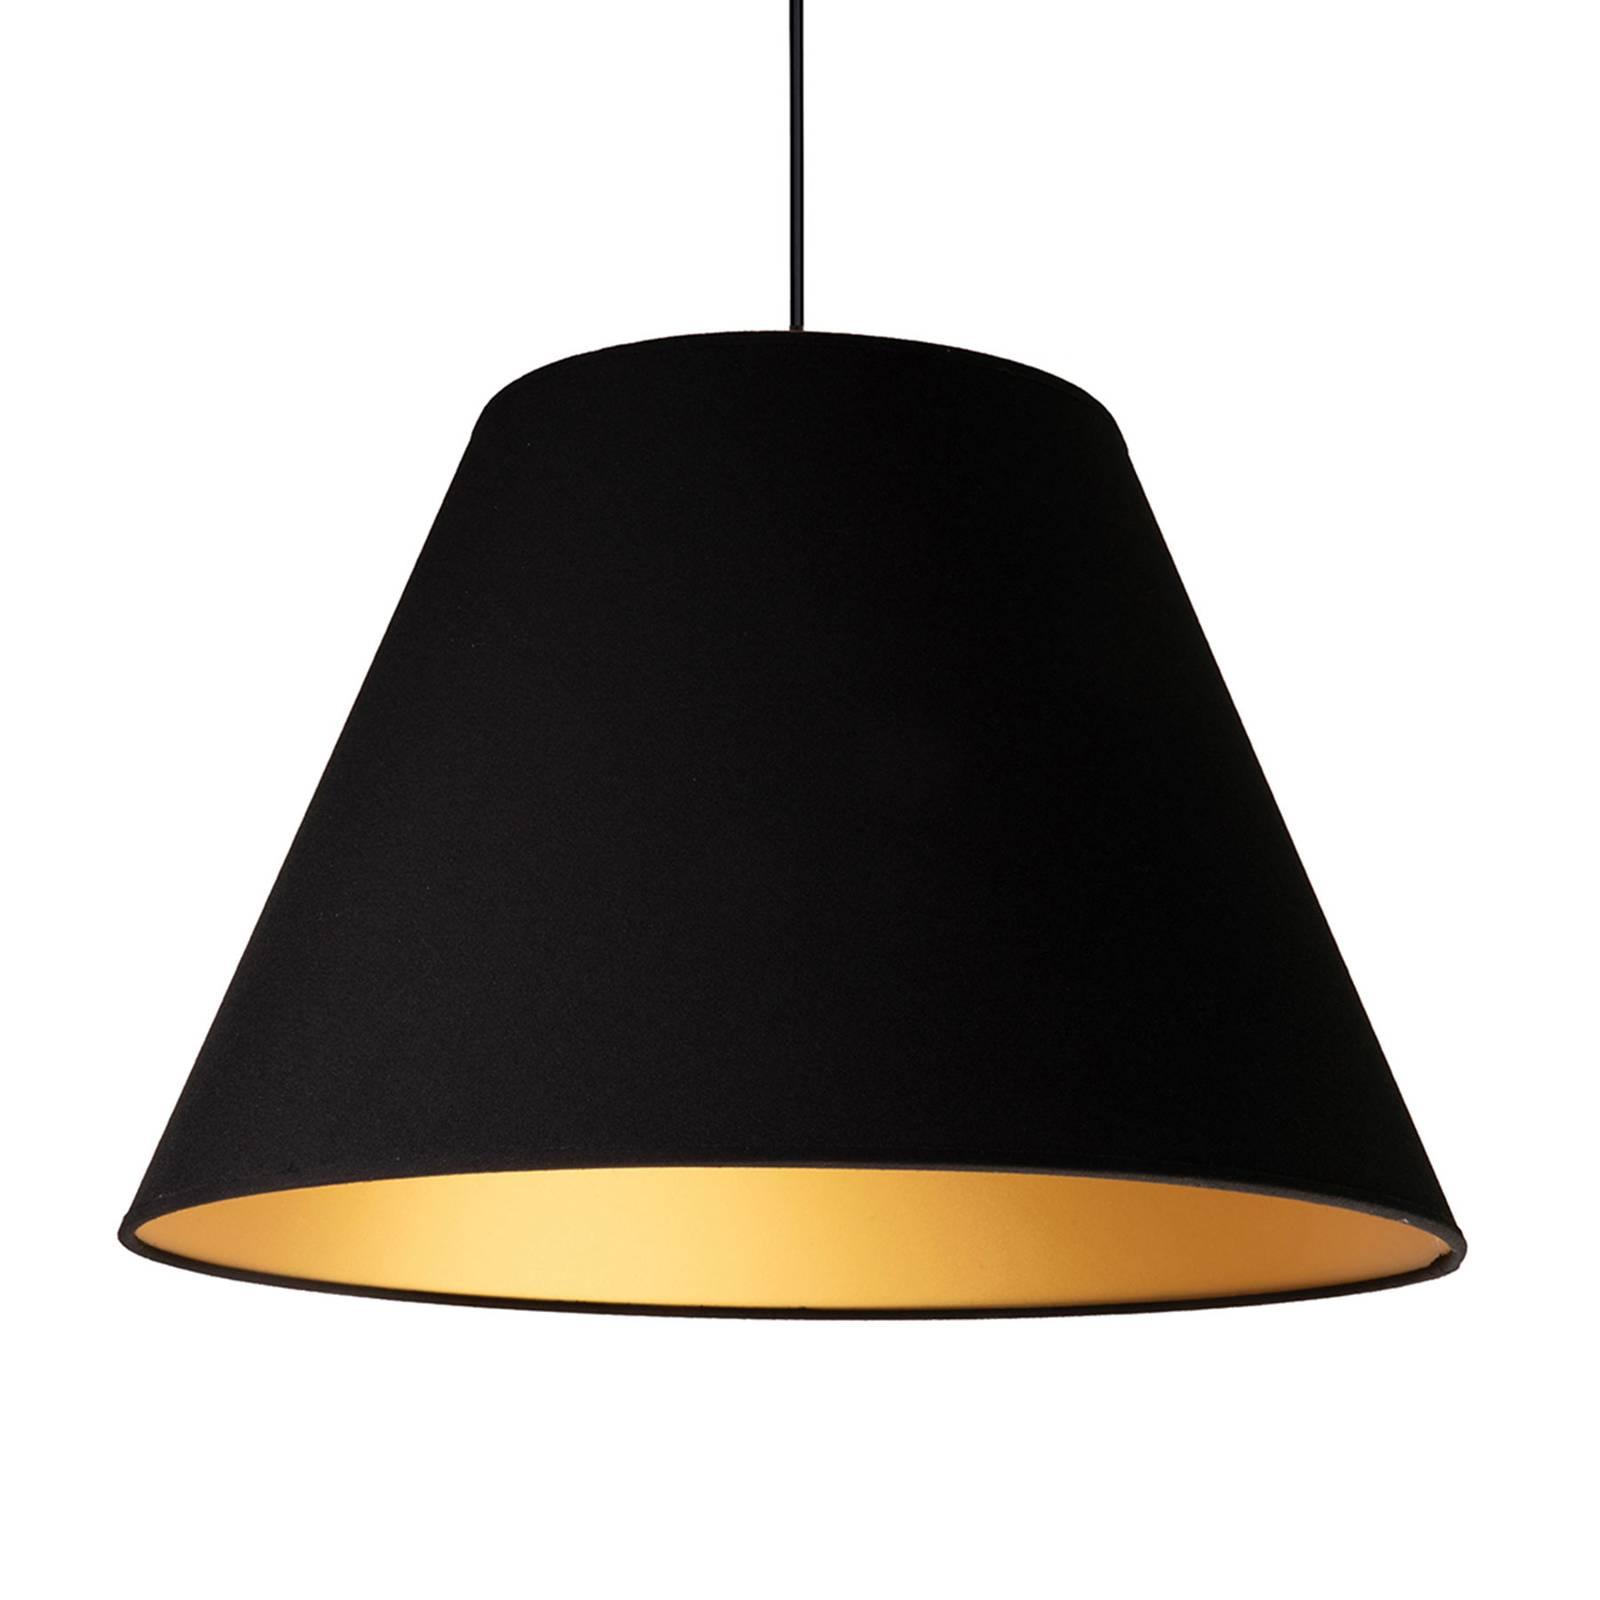 Hanglamp Anna, zwart, binnenkant goud